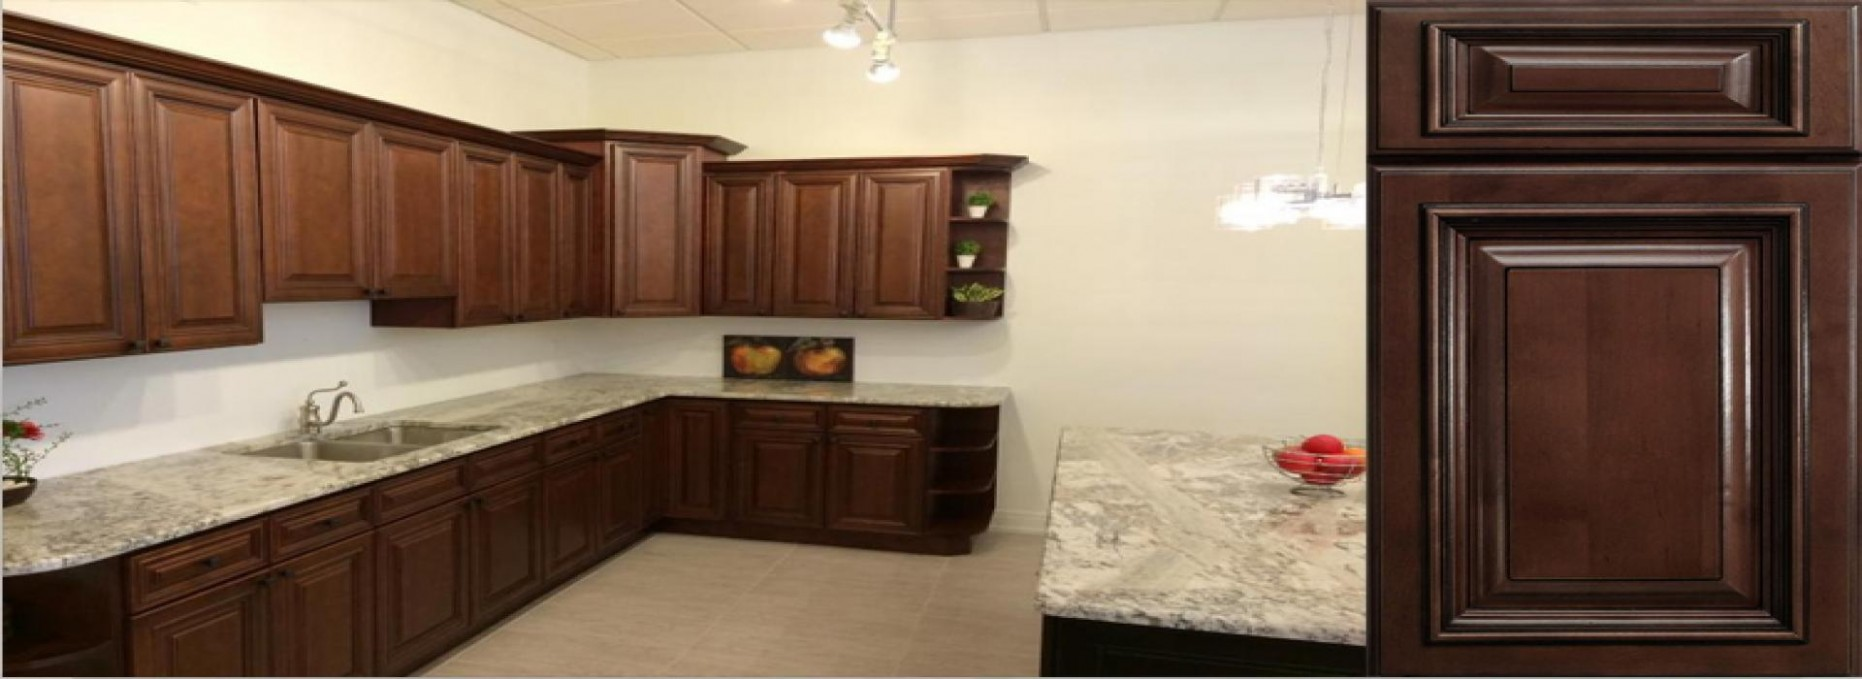 Aline International - Kitchen Cabinets Mokena Il